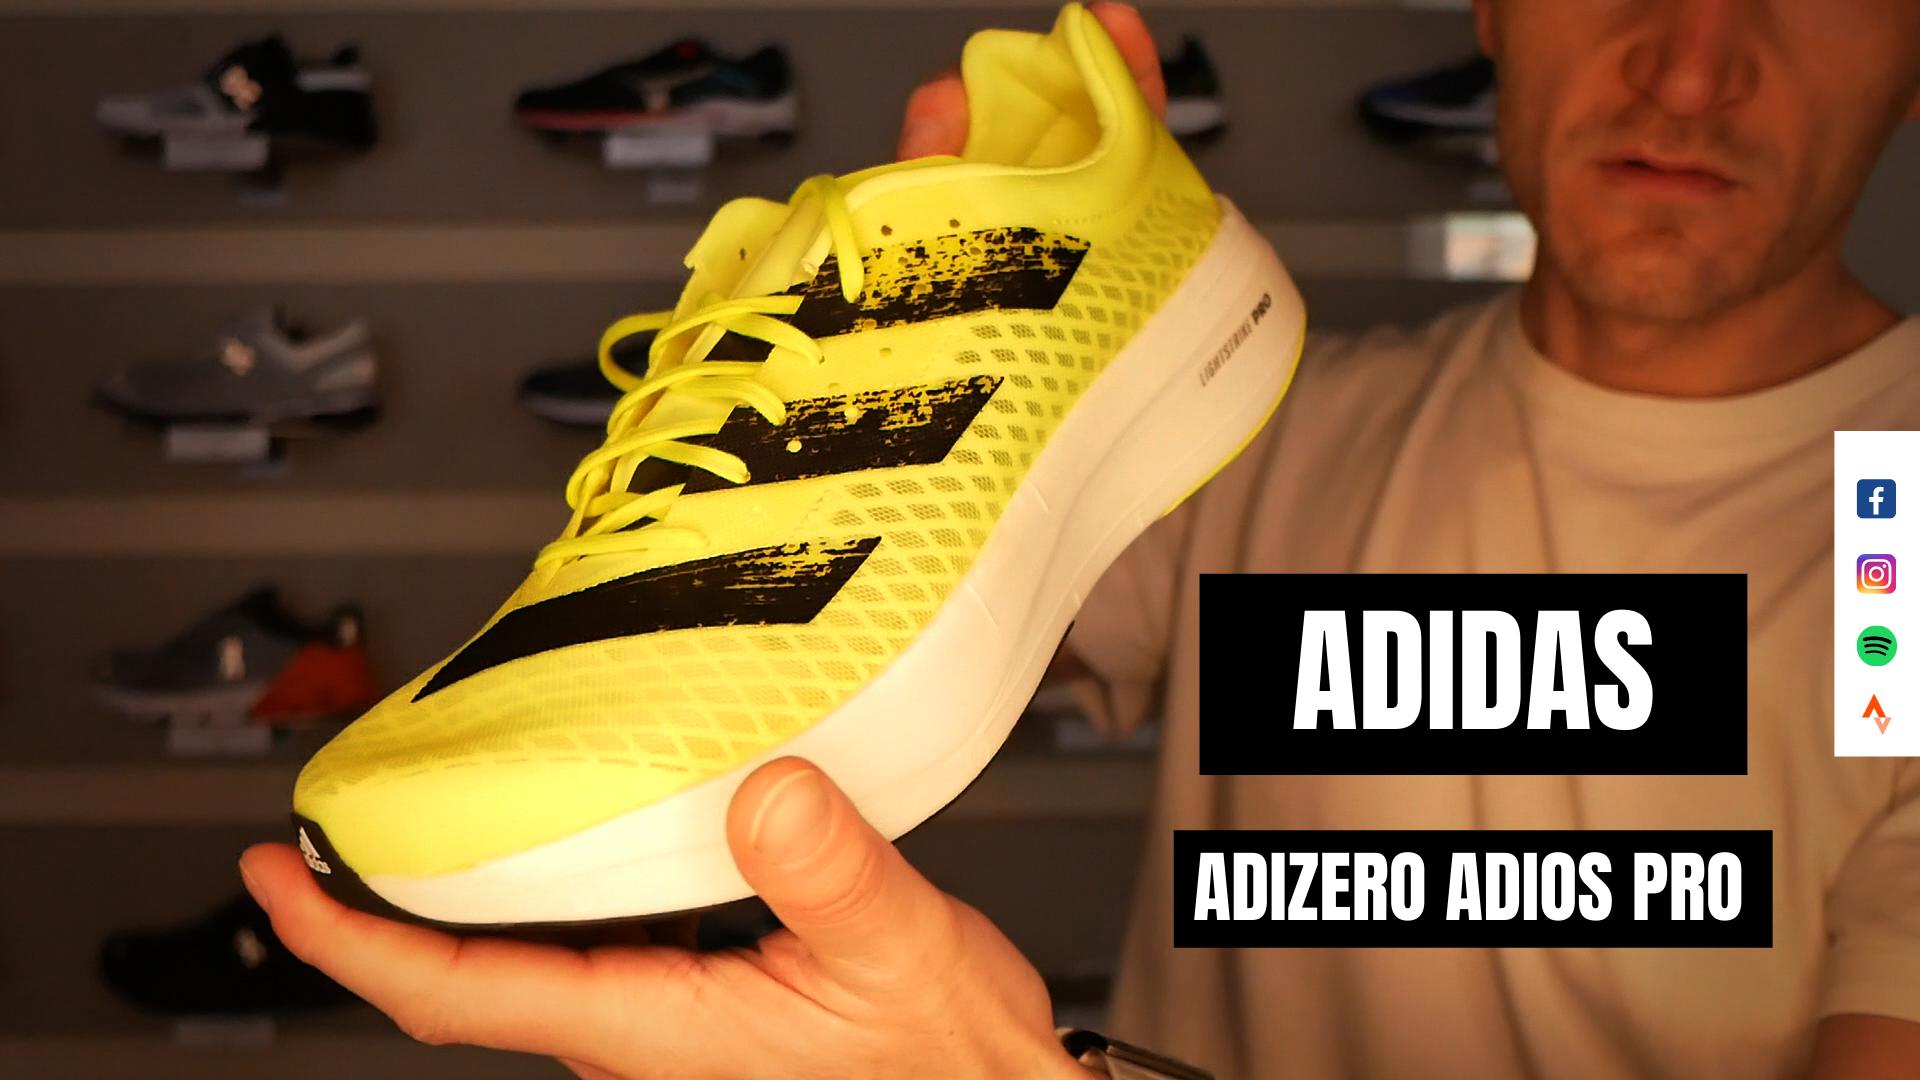 Review: Adidas Adizero Adios Pro